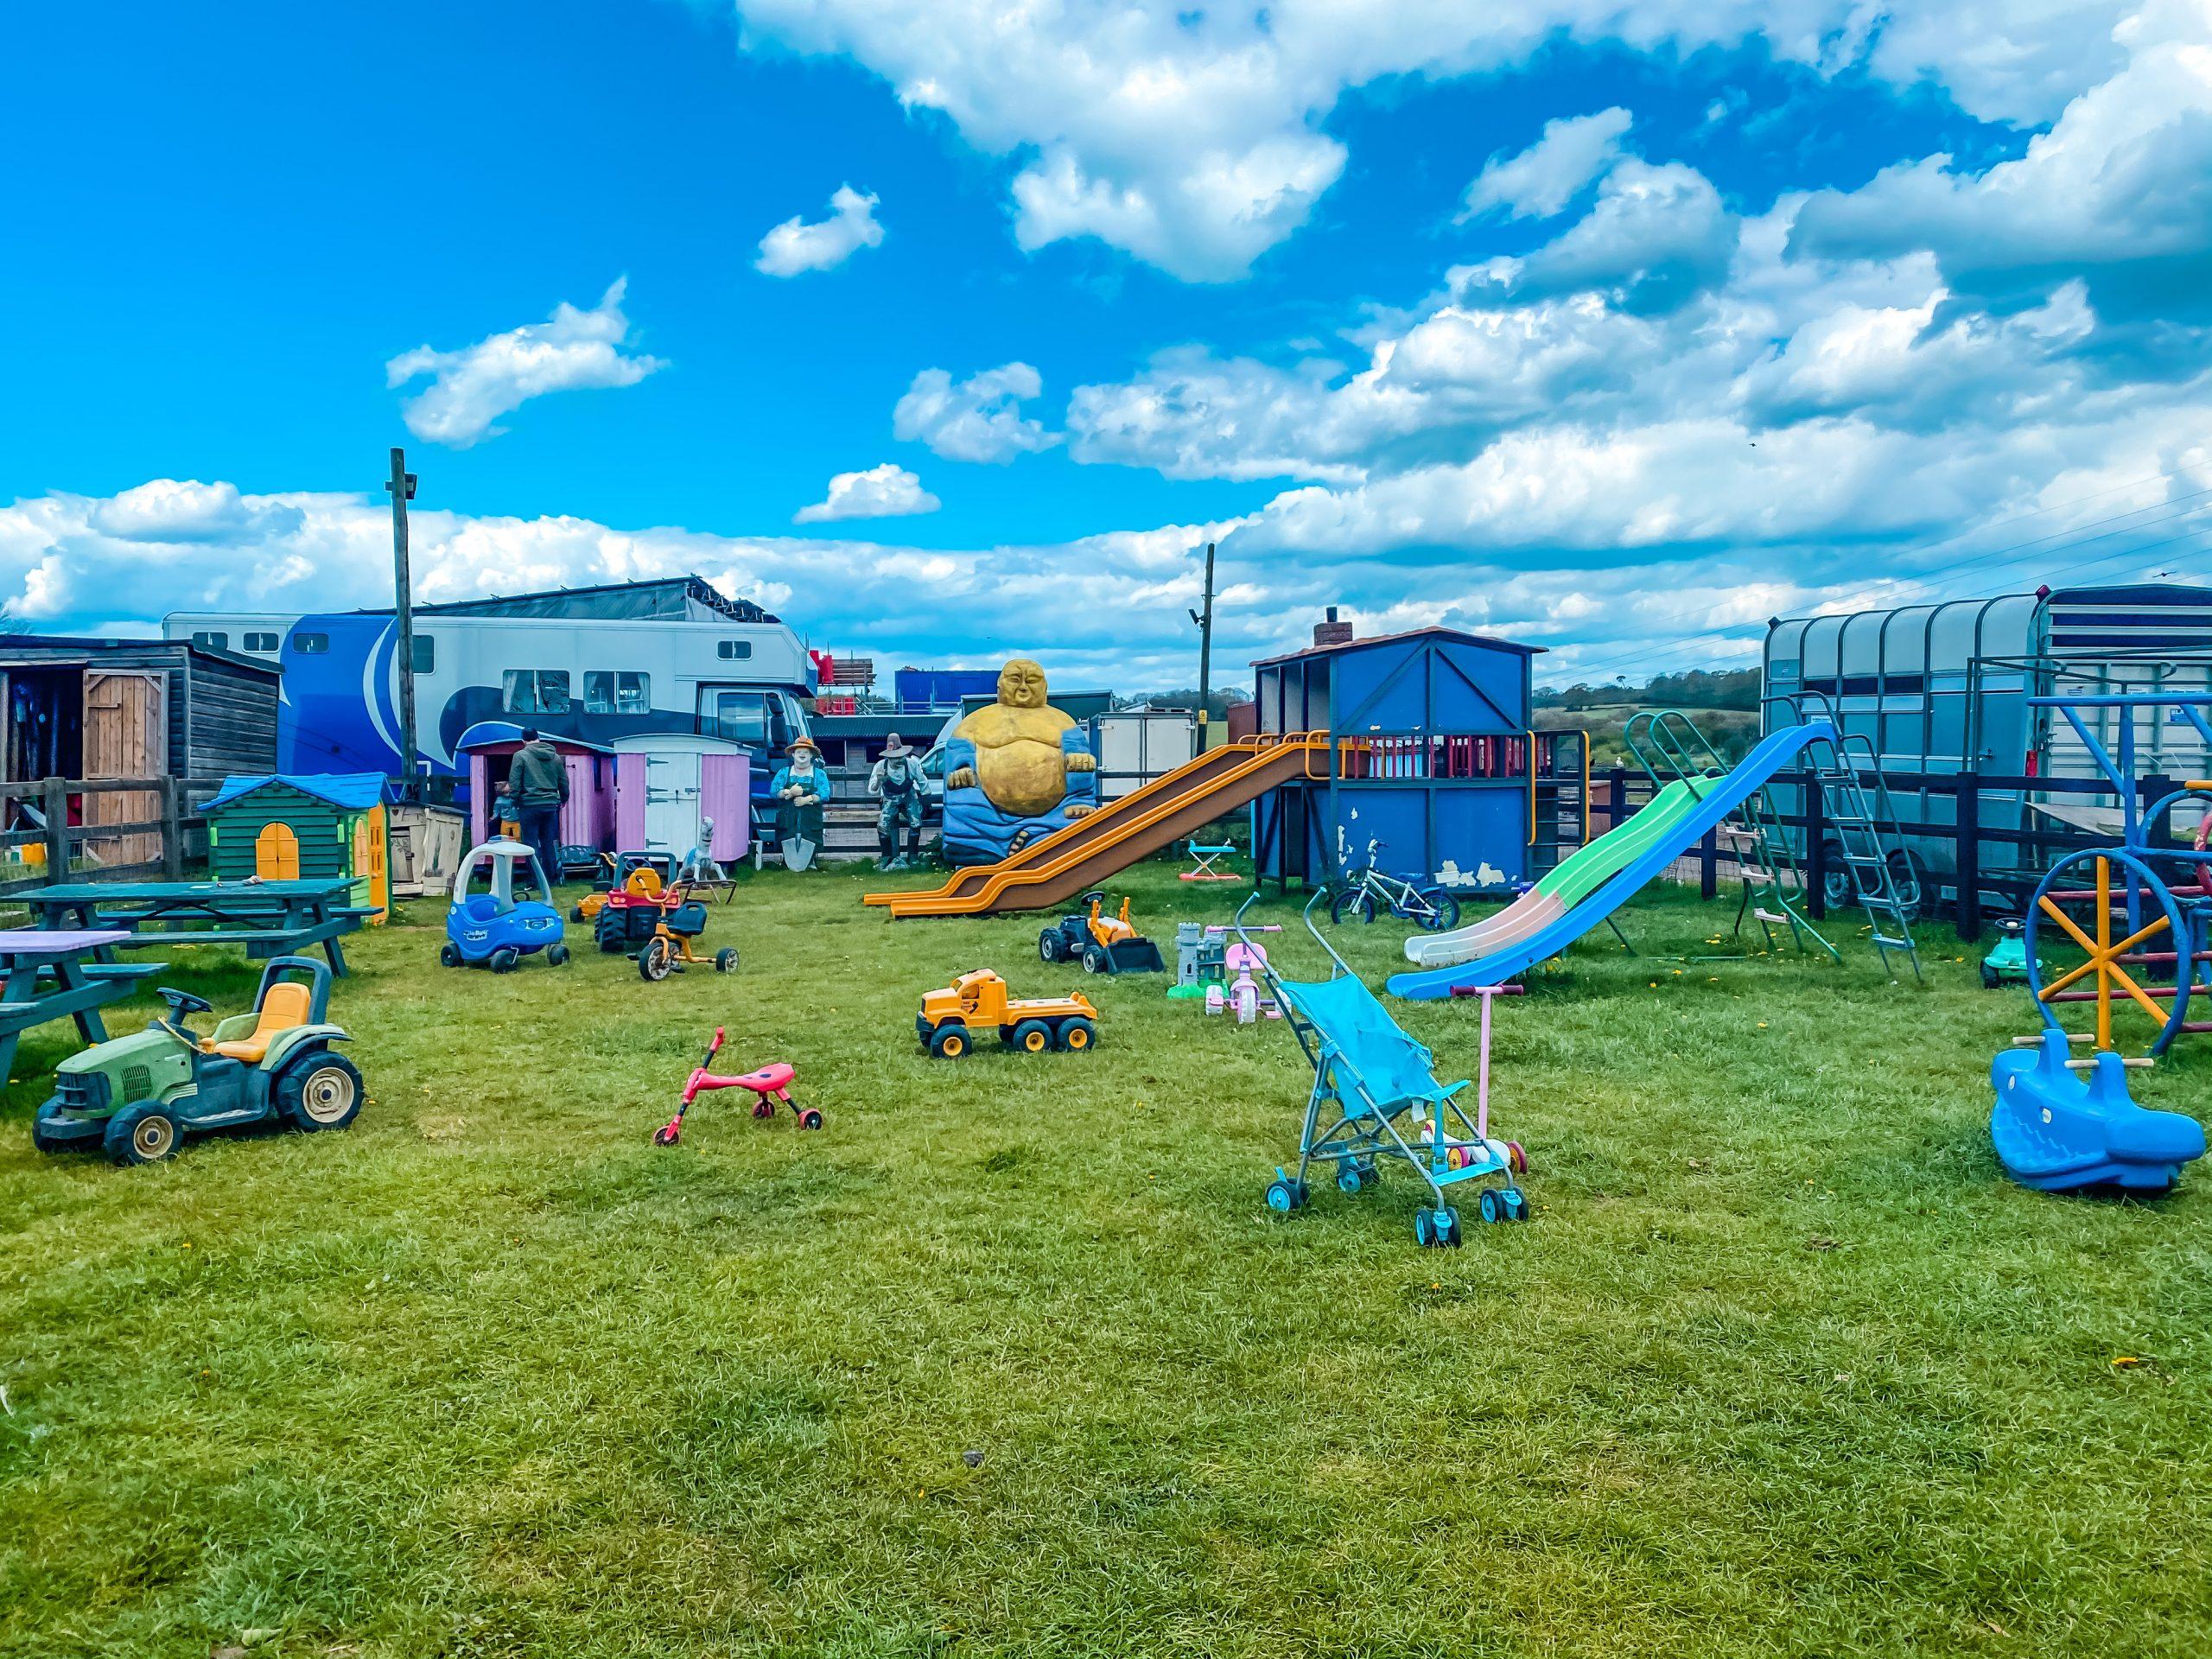 Play area at Nathan's Farm